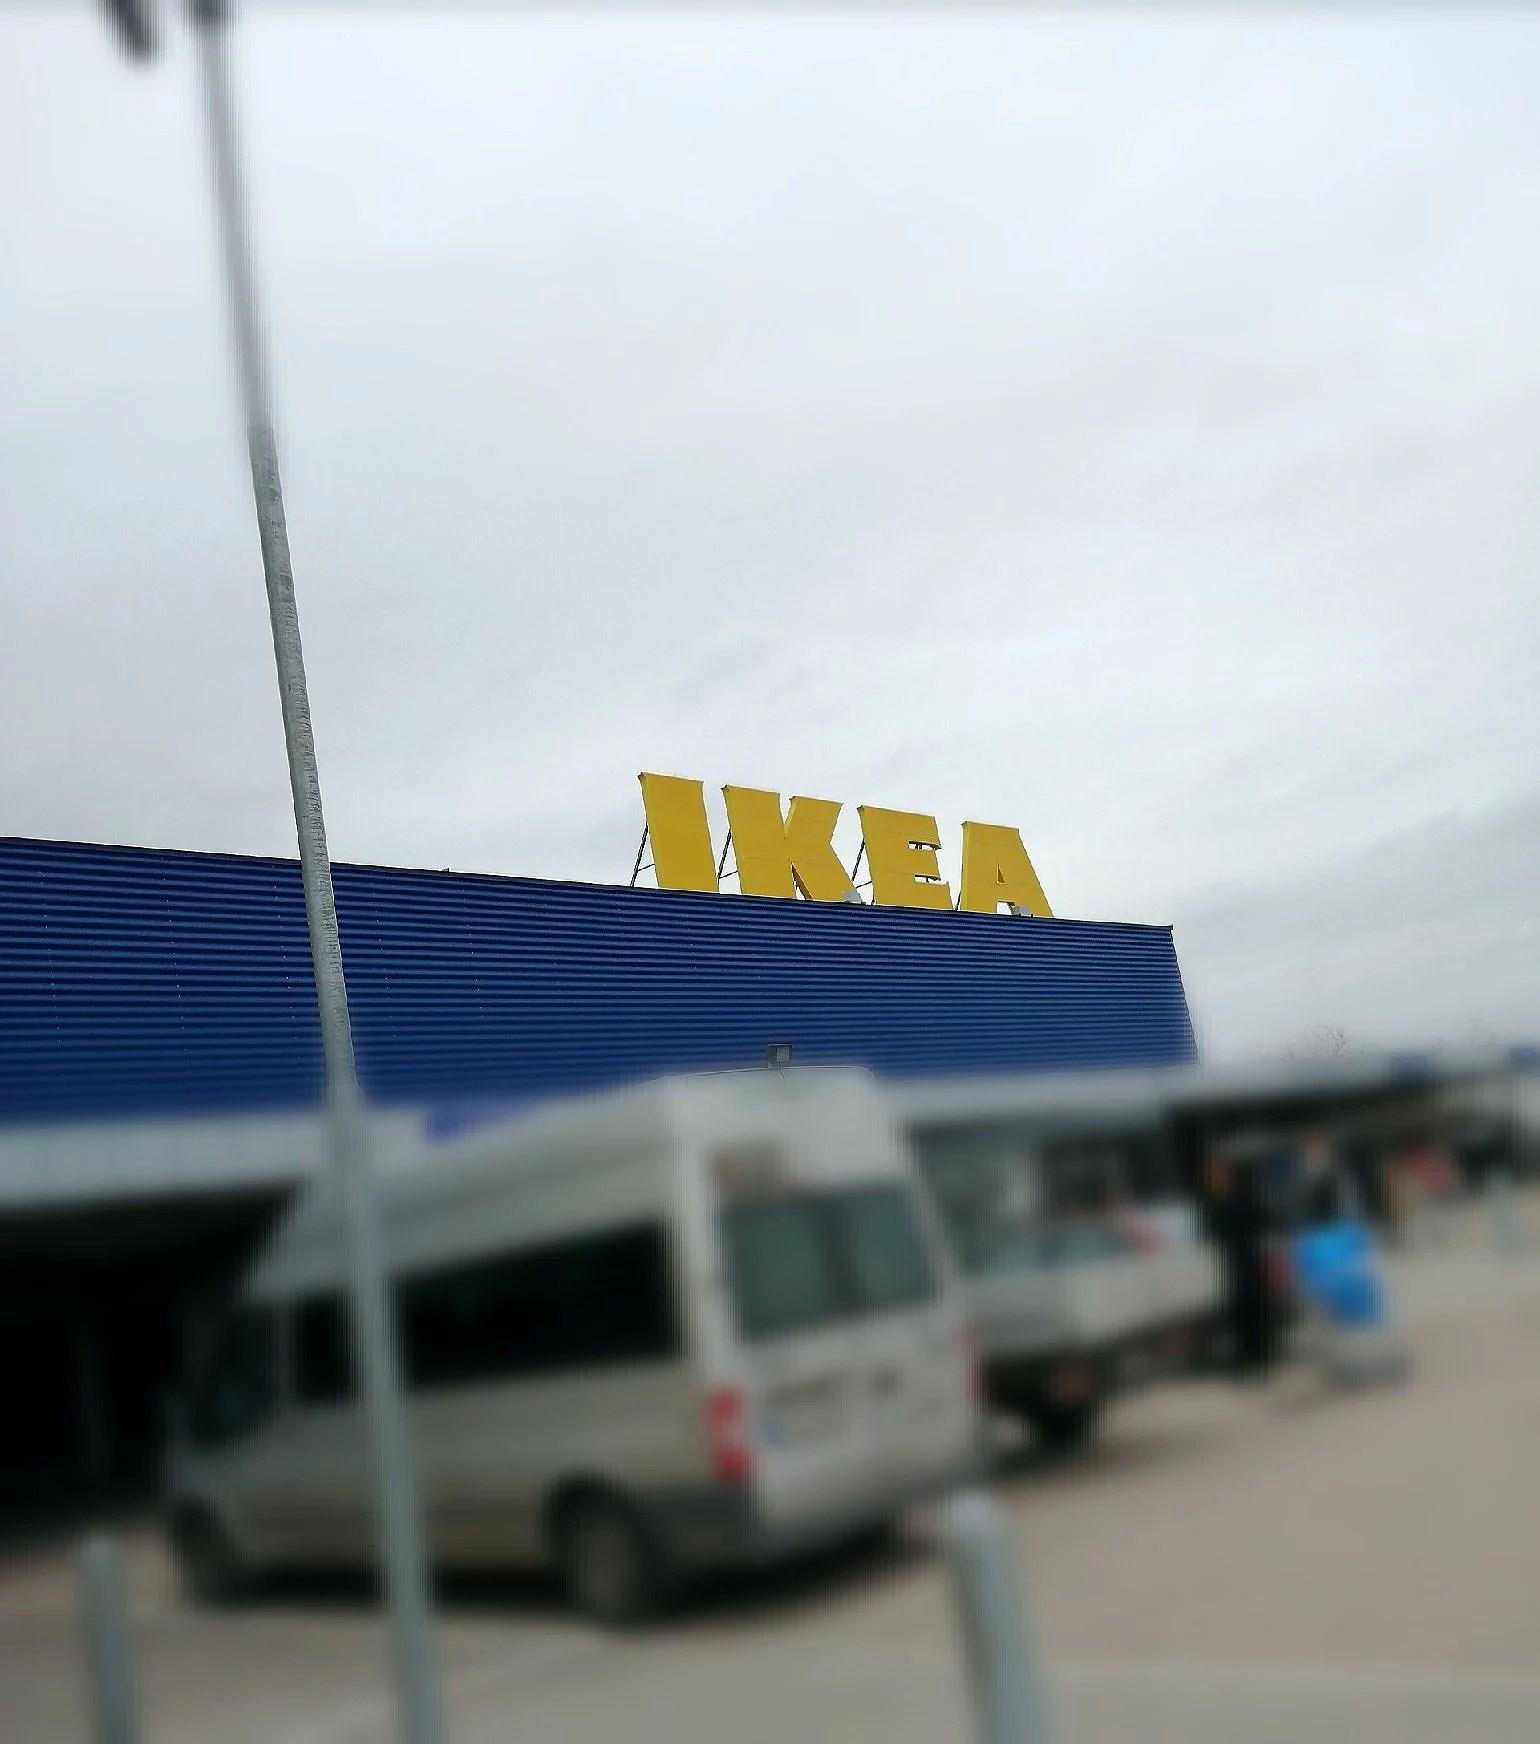 Shoppaaaa